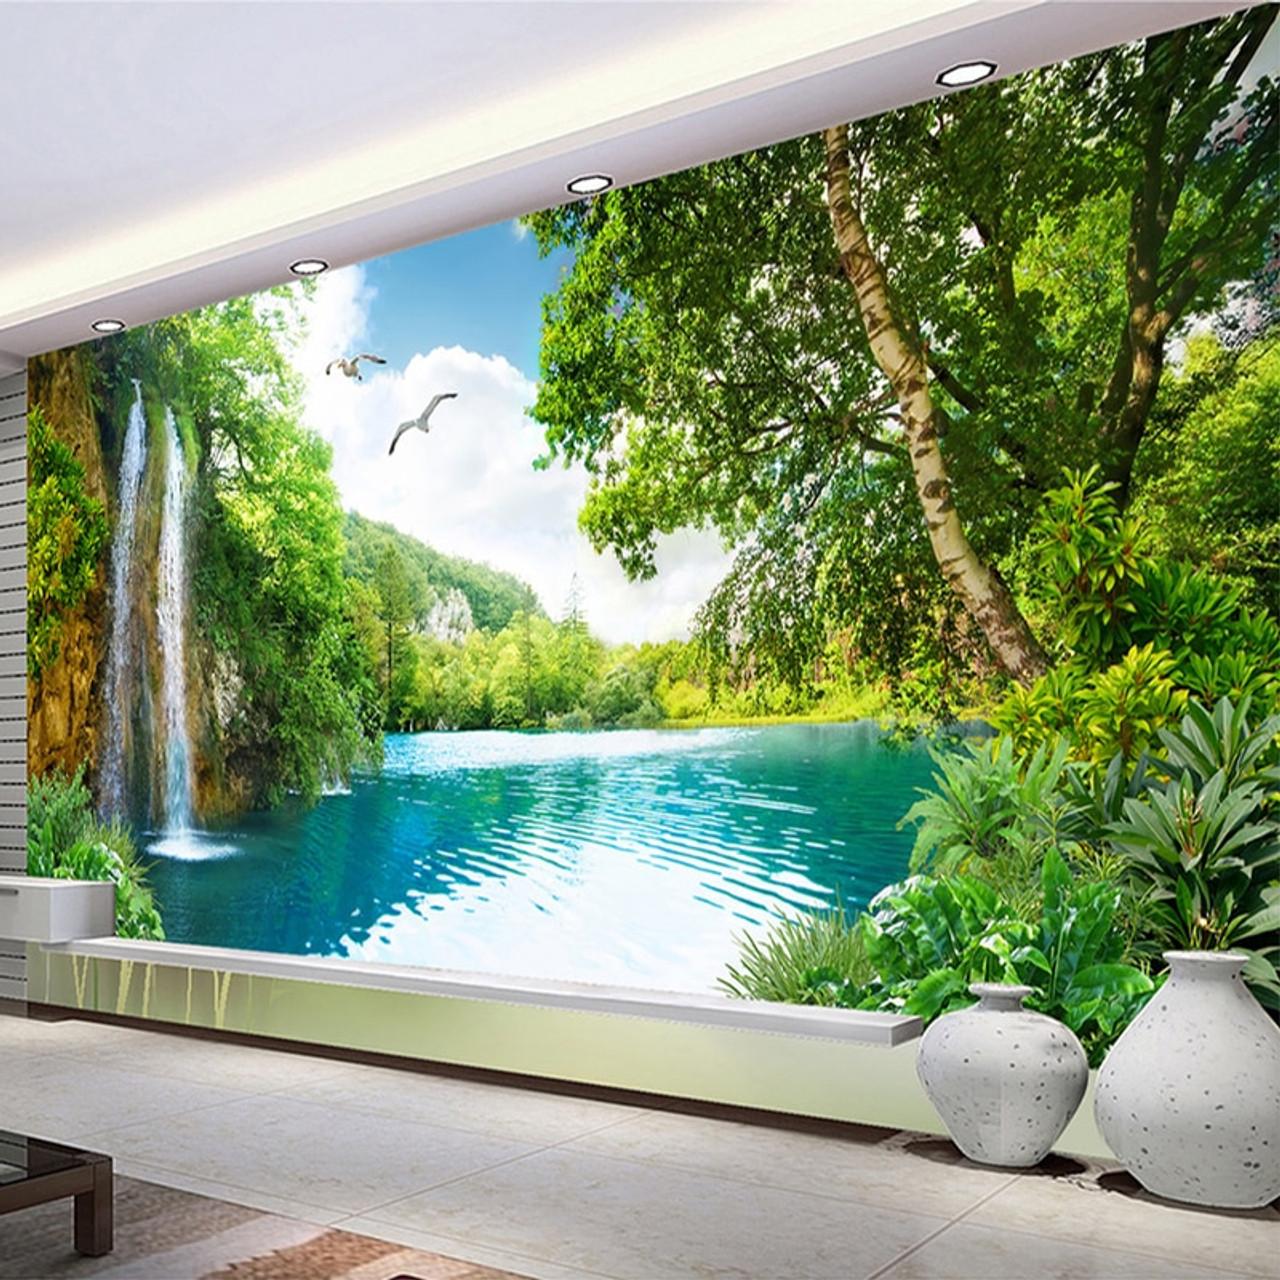 Custom 3D Wall Mural Wallpaper Home Decor Green Mountain Waterfall Nature Landscape 3D Photo Wall Paper  04493.1567751432